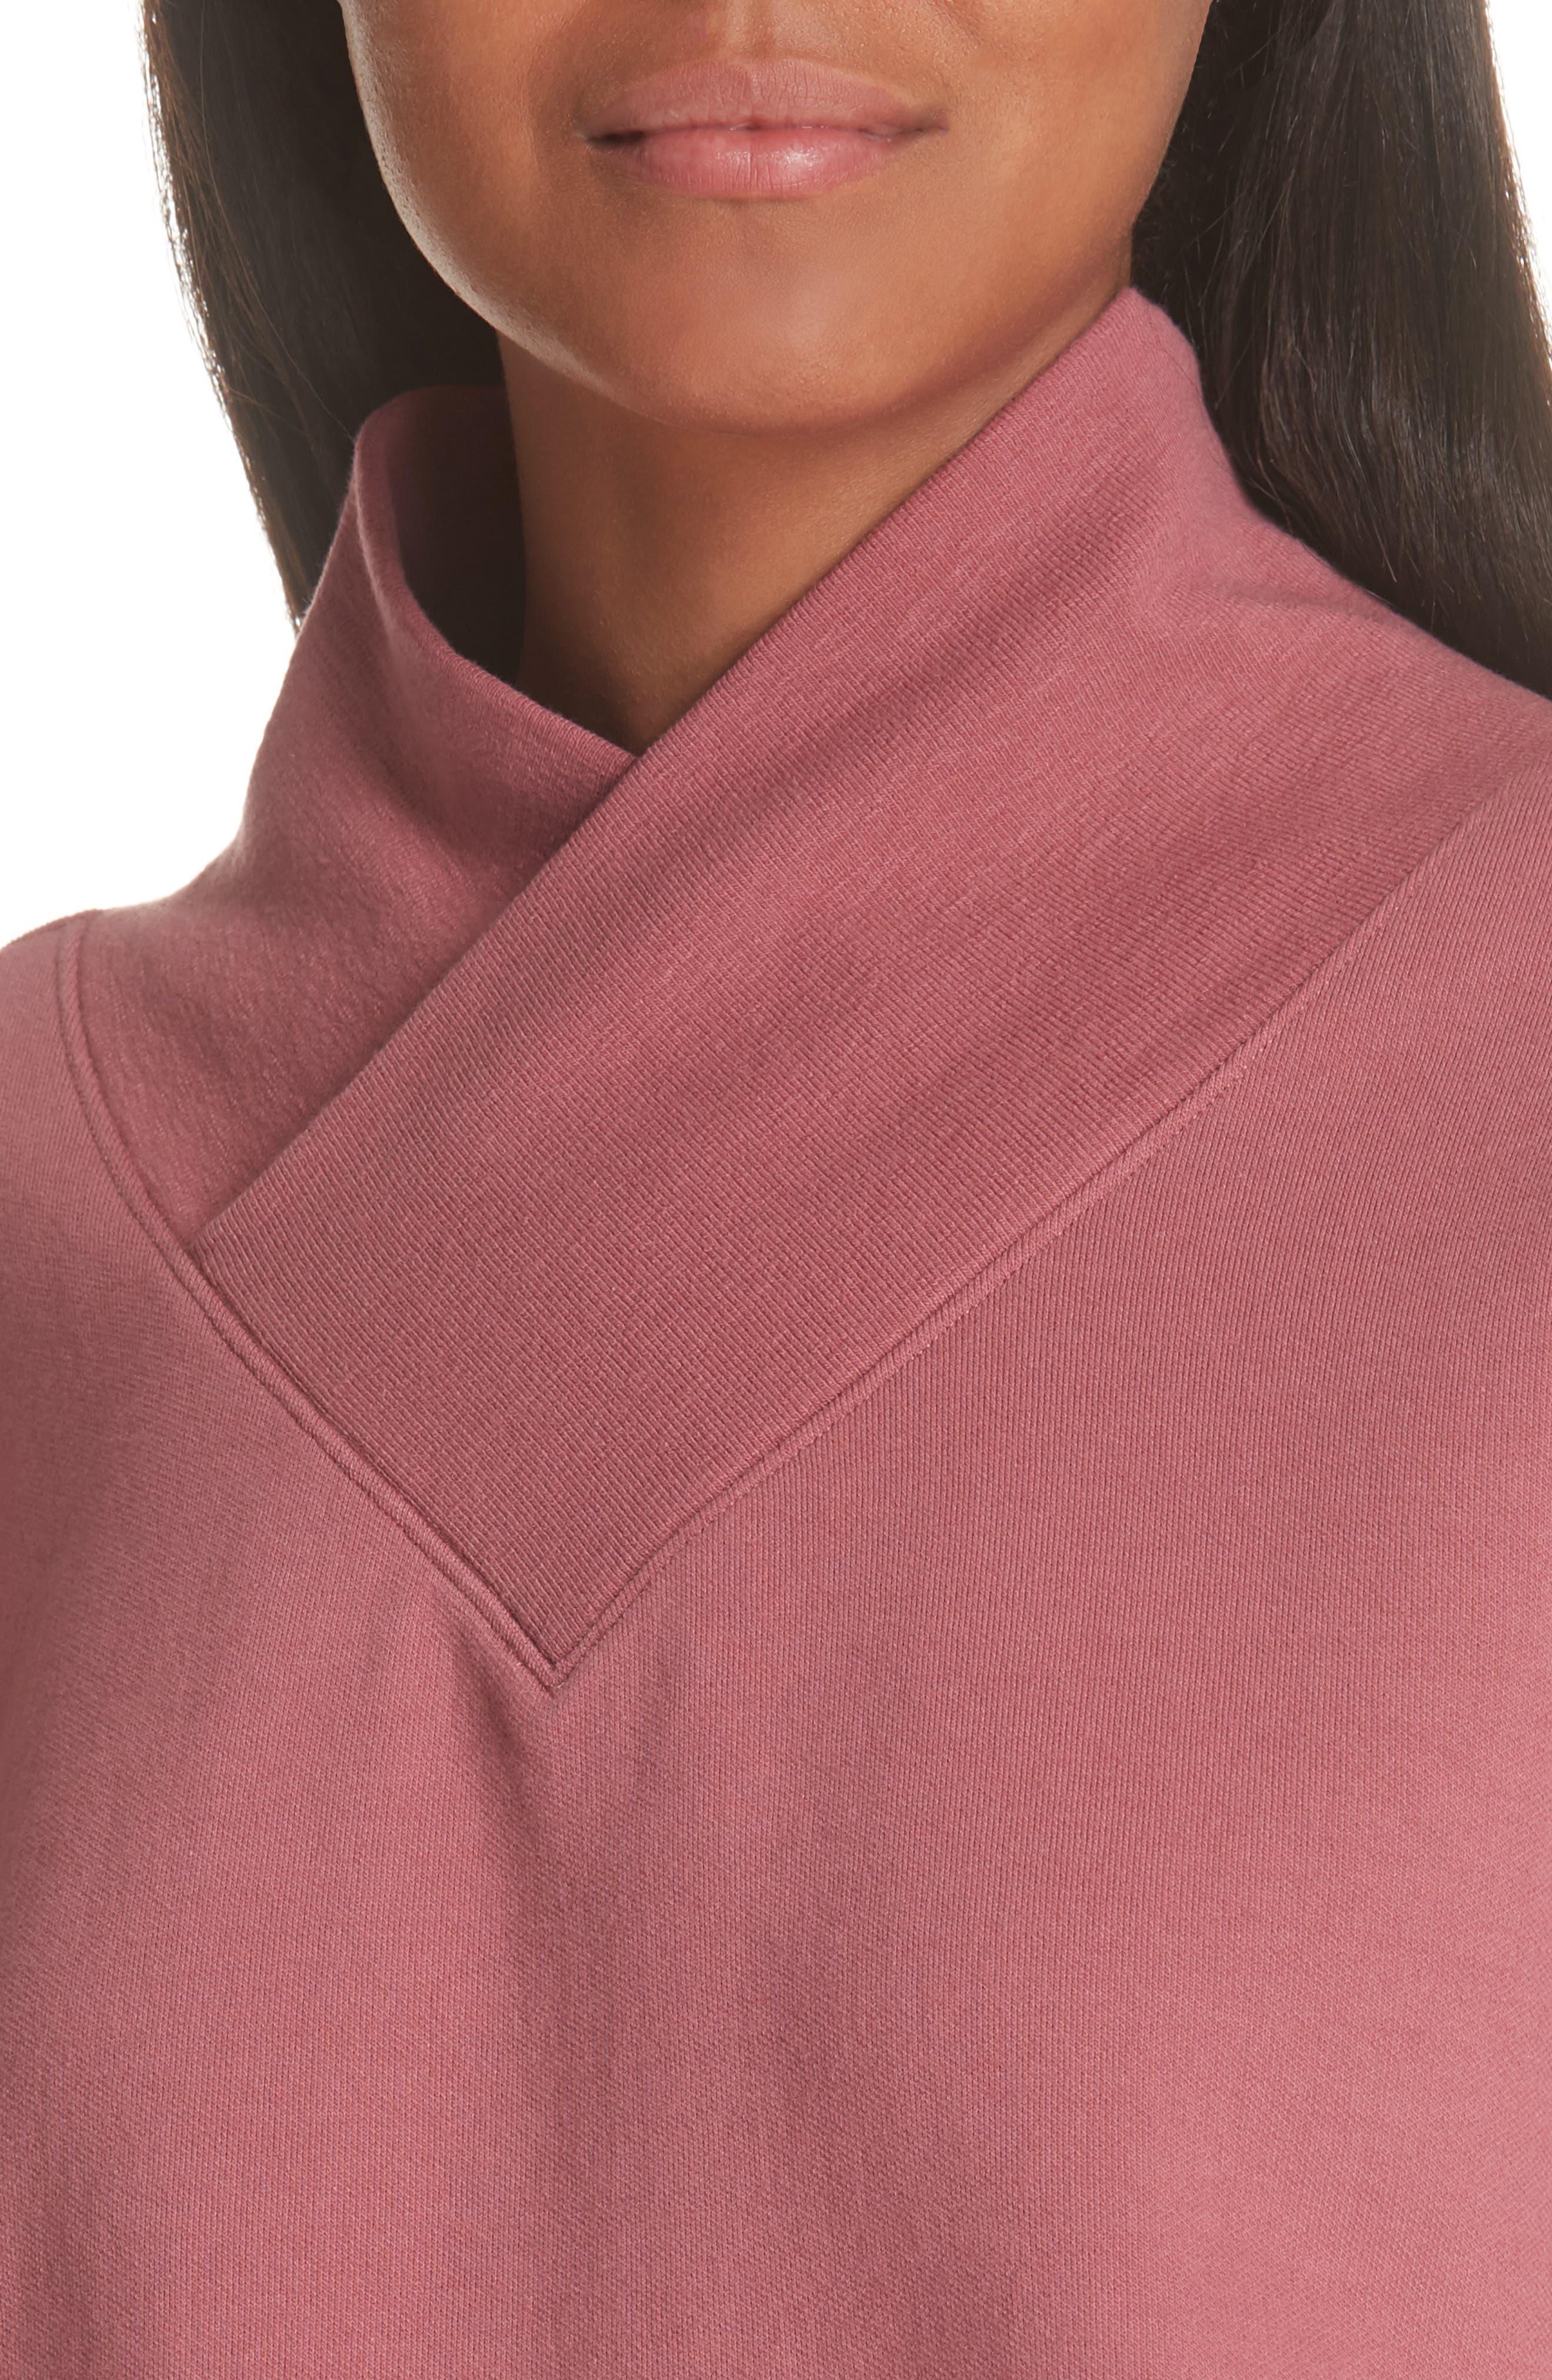 Unbalanced Sweatshirt,                             Alternate thumbnail 4, color,                             BURGUNDY